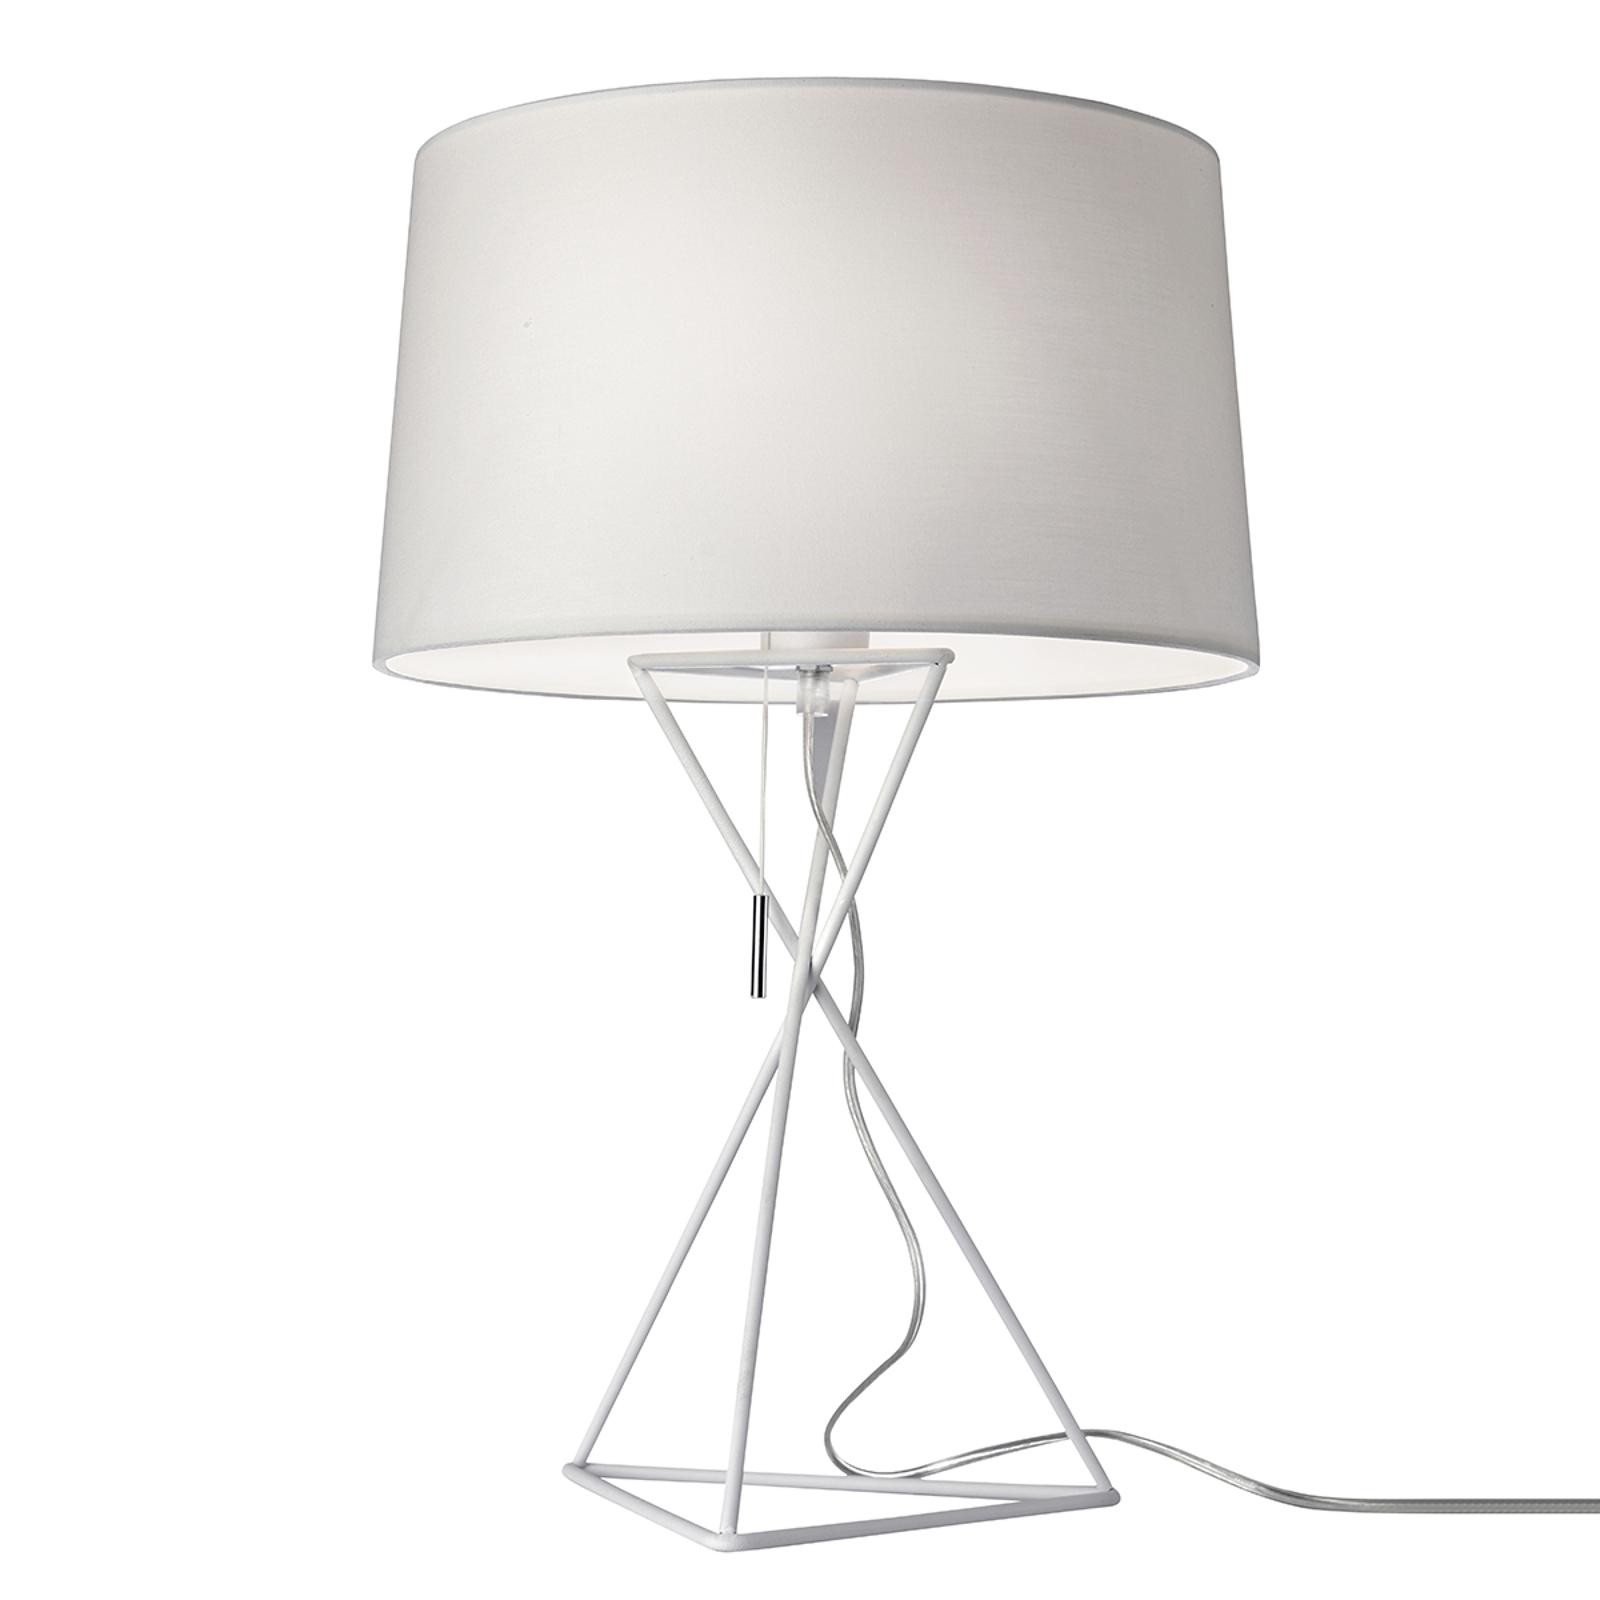 Lampe à poser New York en textile blanc